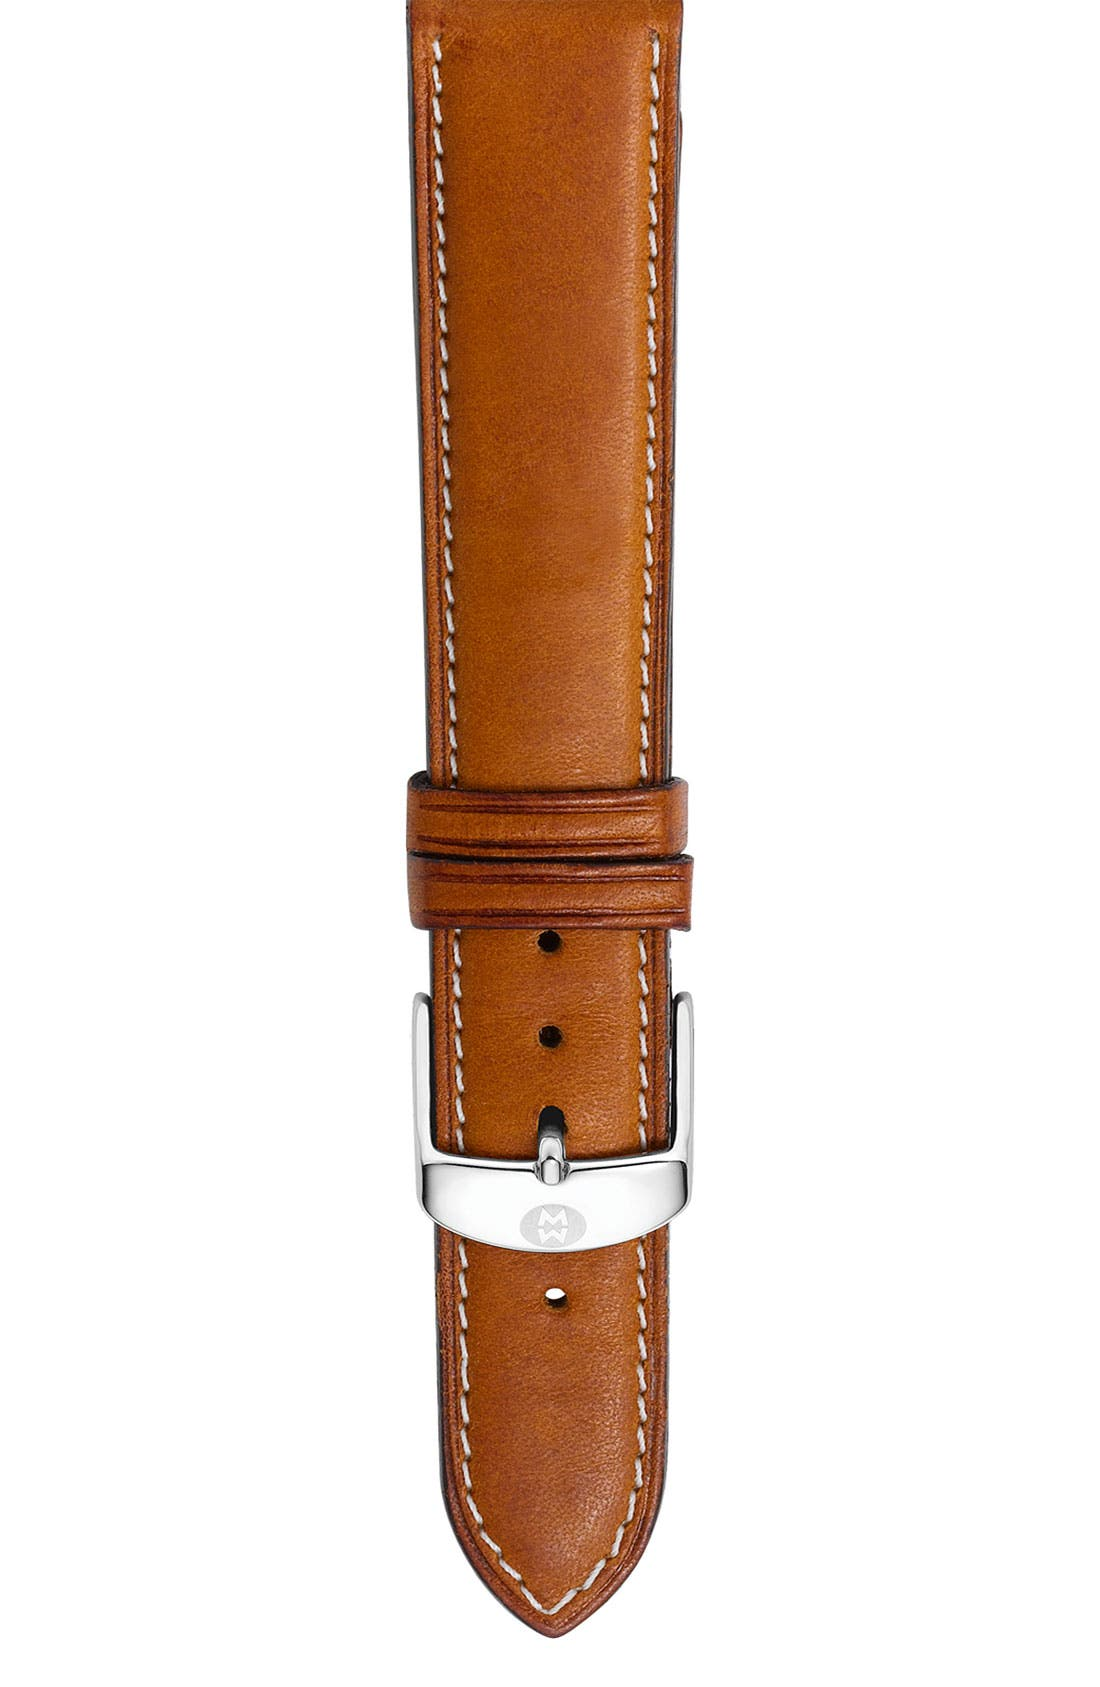 MICHELE 16mm Calfskin Leather Watch Strap